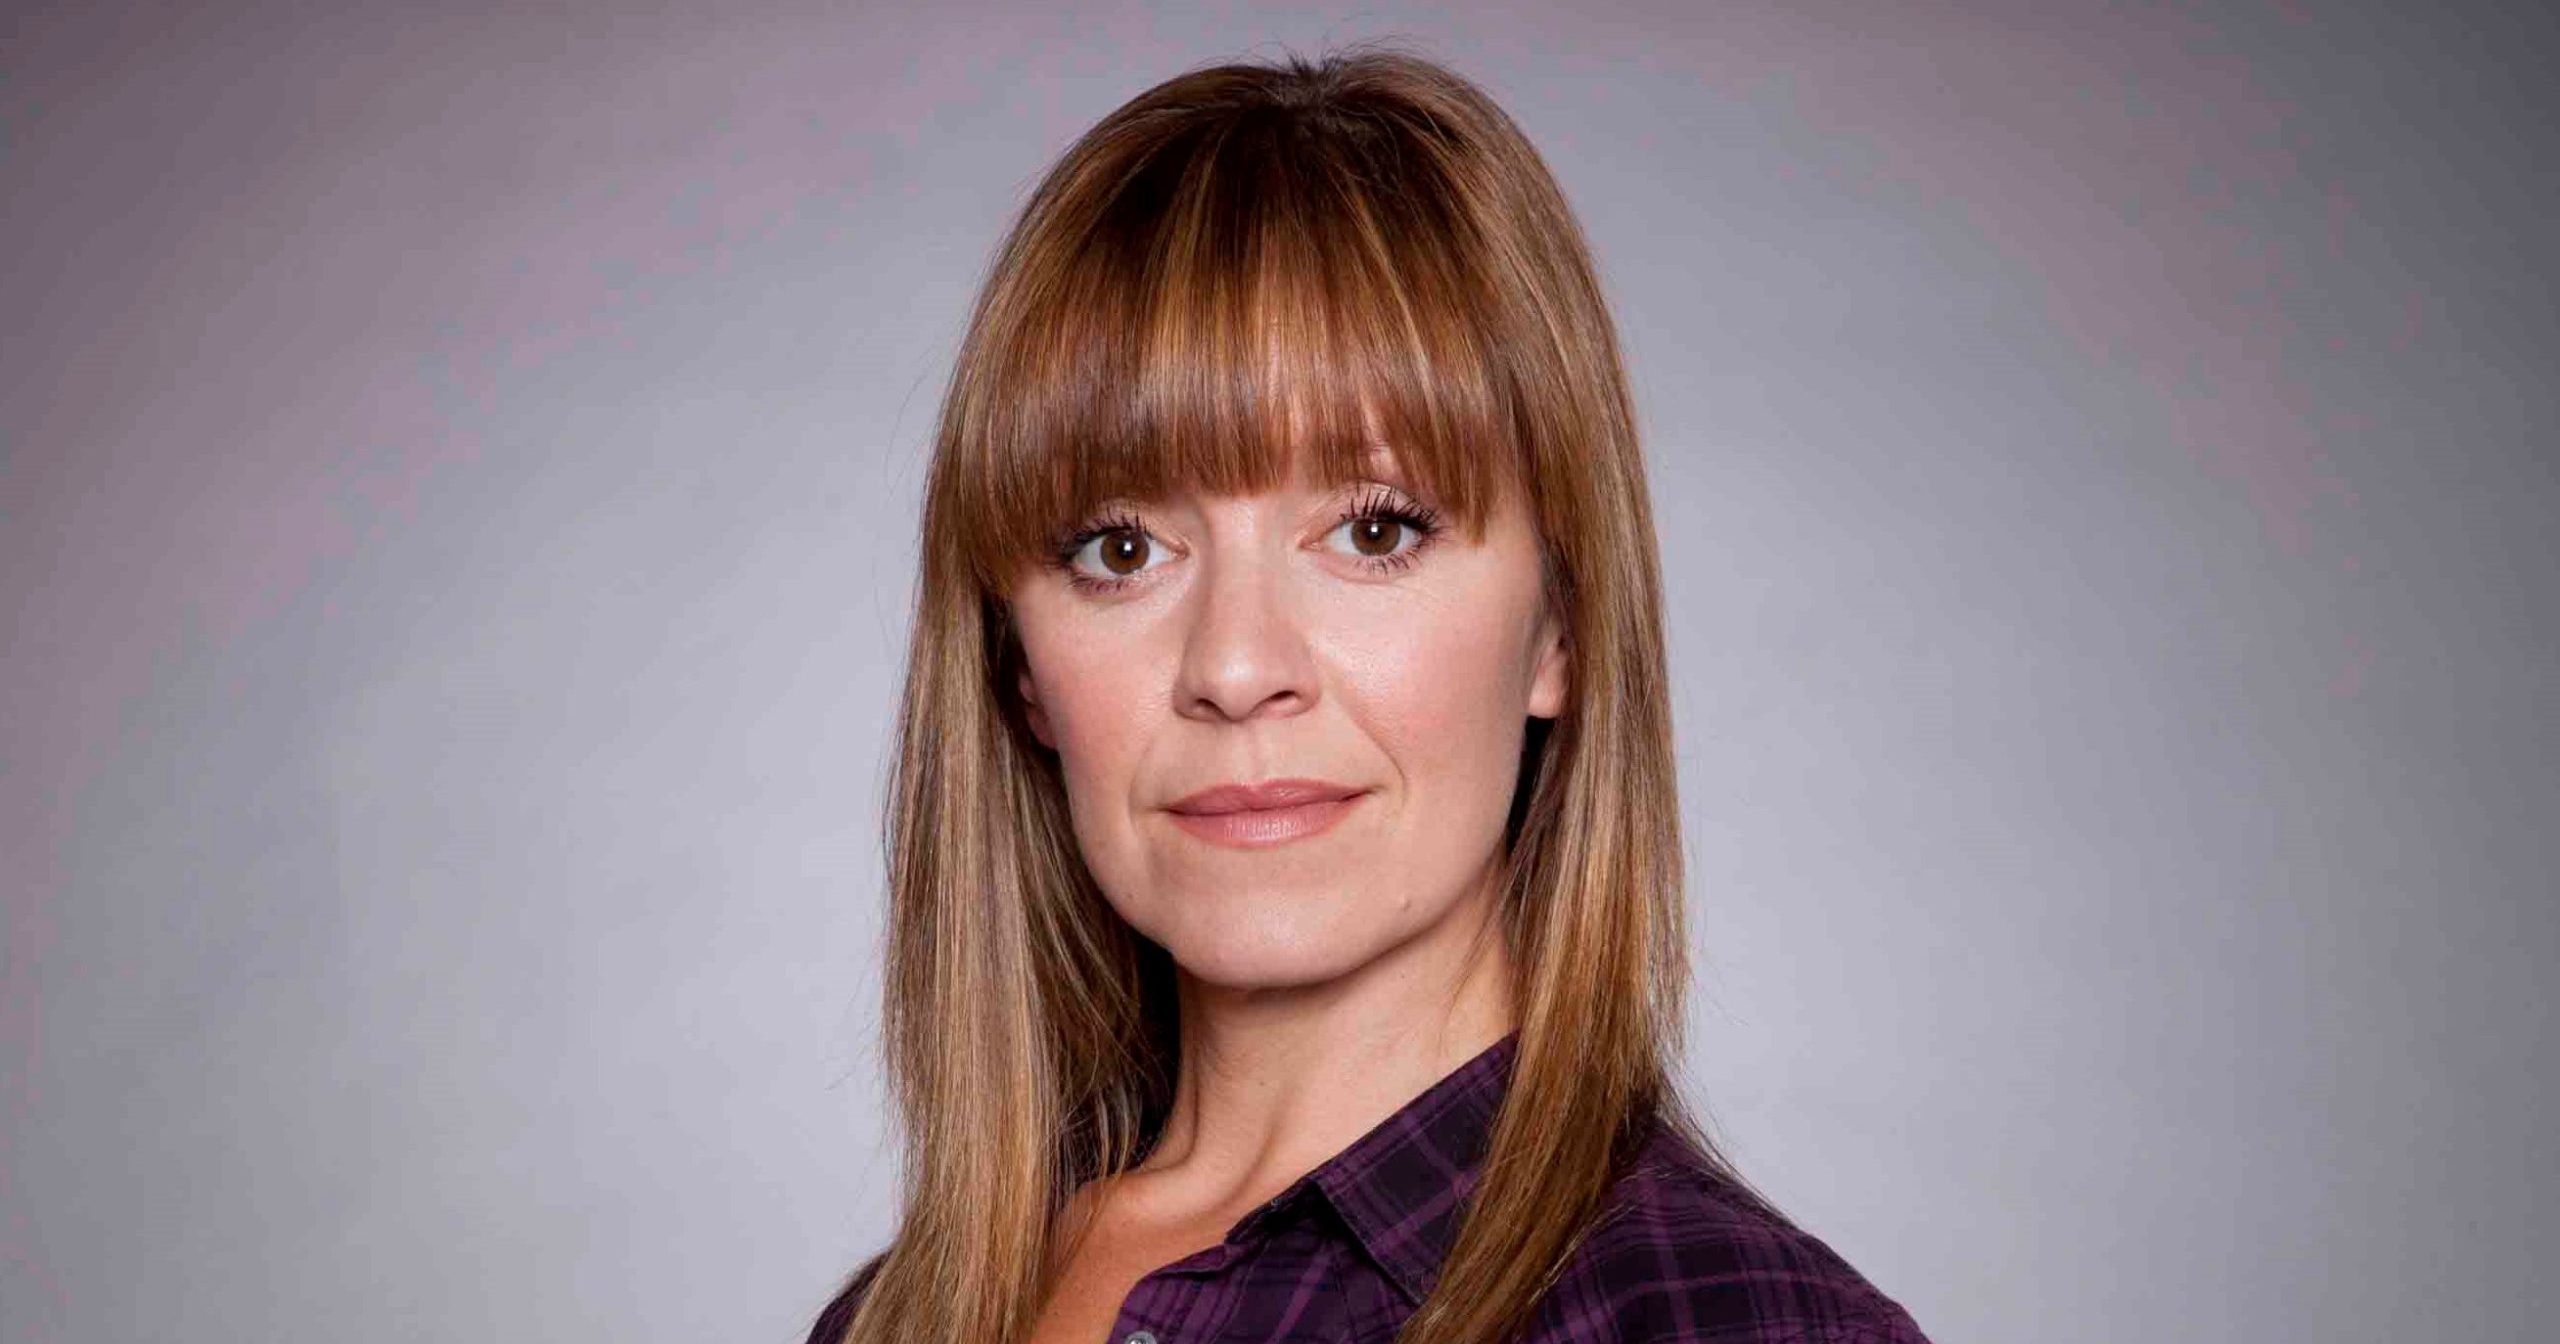 Emmerdale SPOILERS: Rhona to reunite with Marlon, hints Zoe Henry